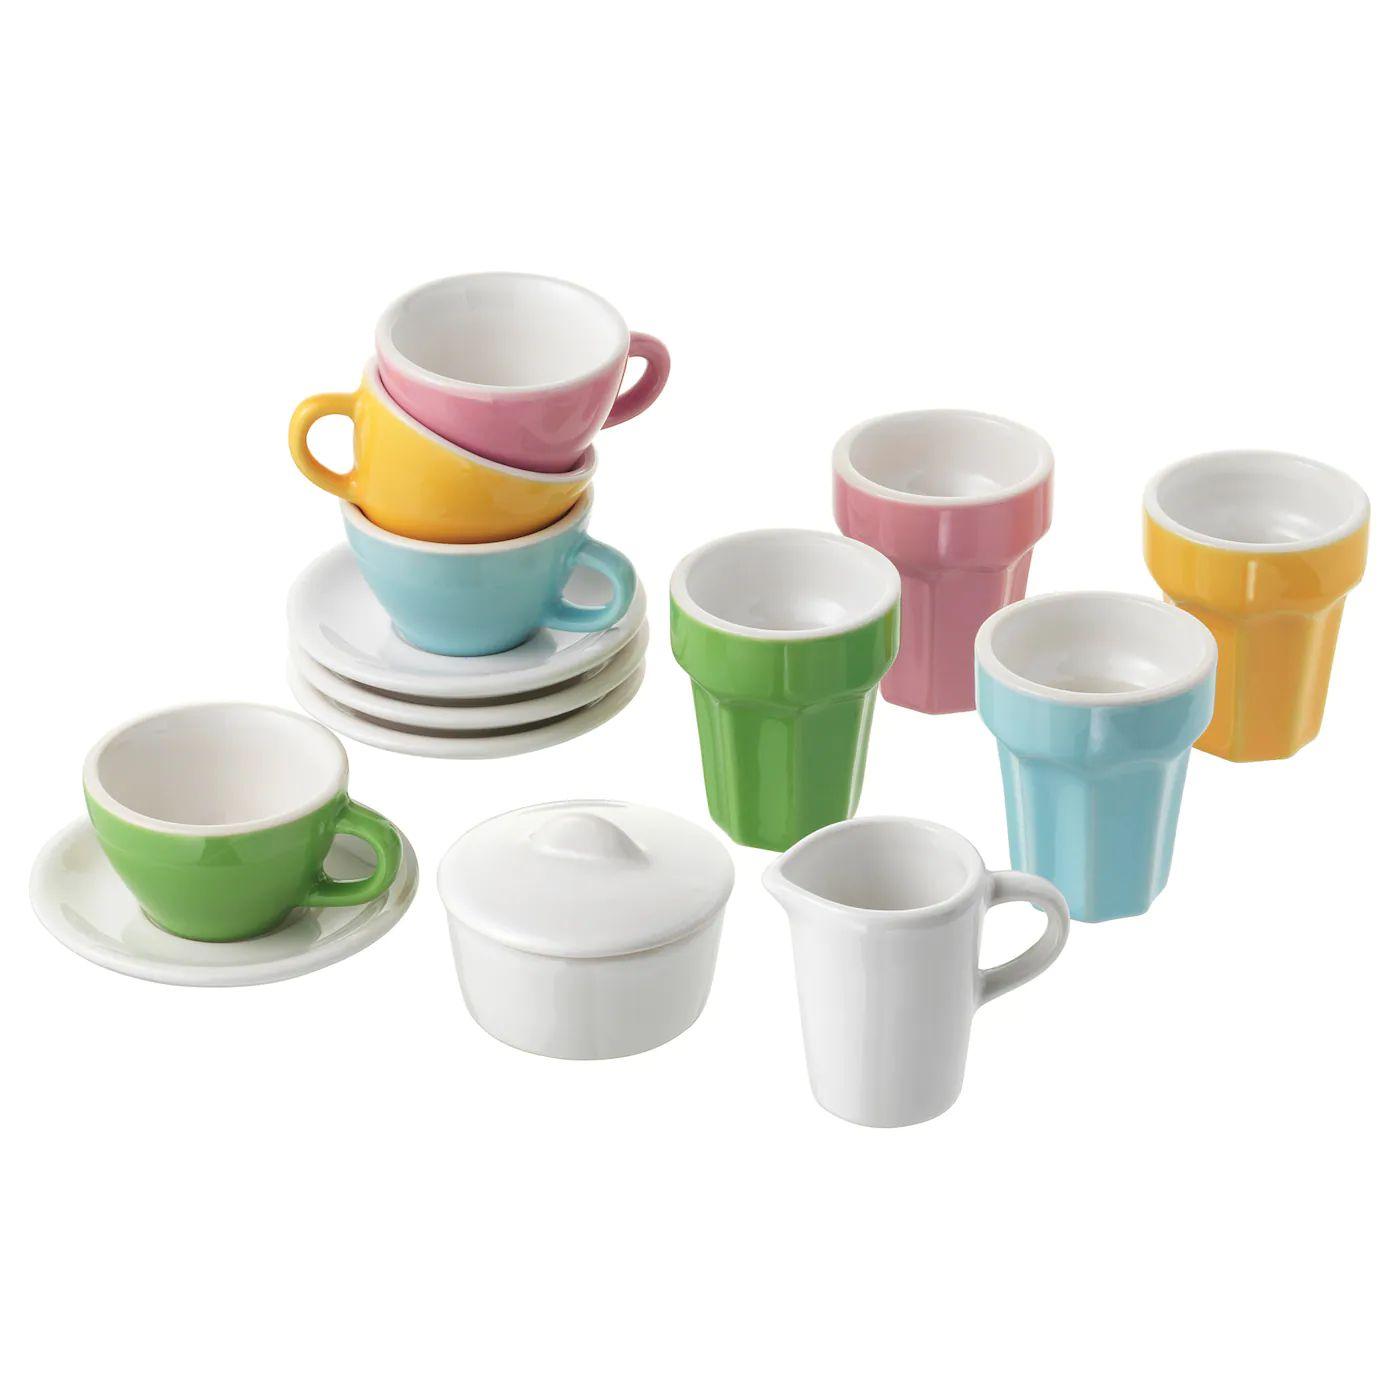 DUKTIG Kinder Kaffee-/Teeservice 10-tlg., bunt, Steinzeug, [Ikea]